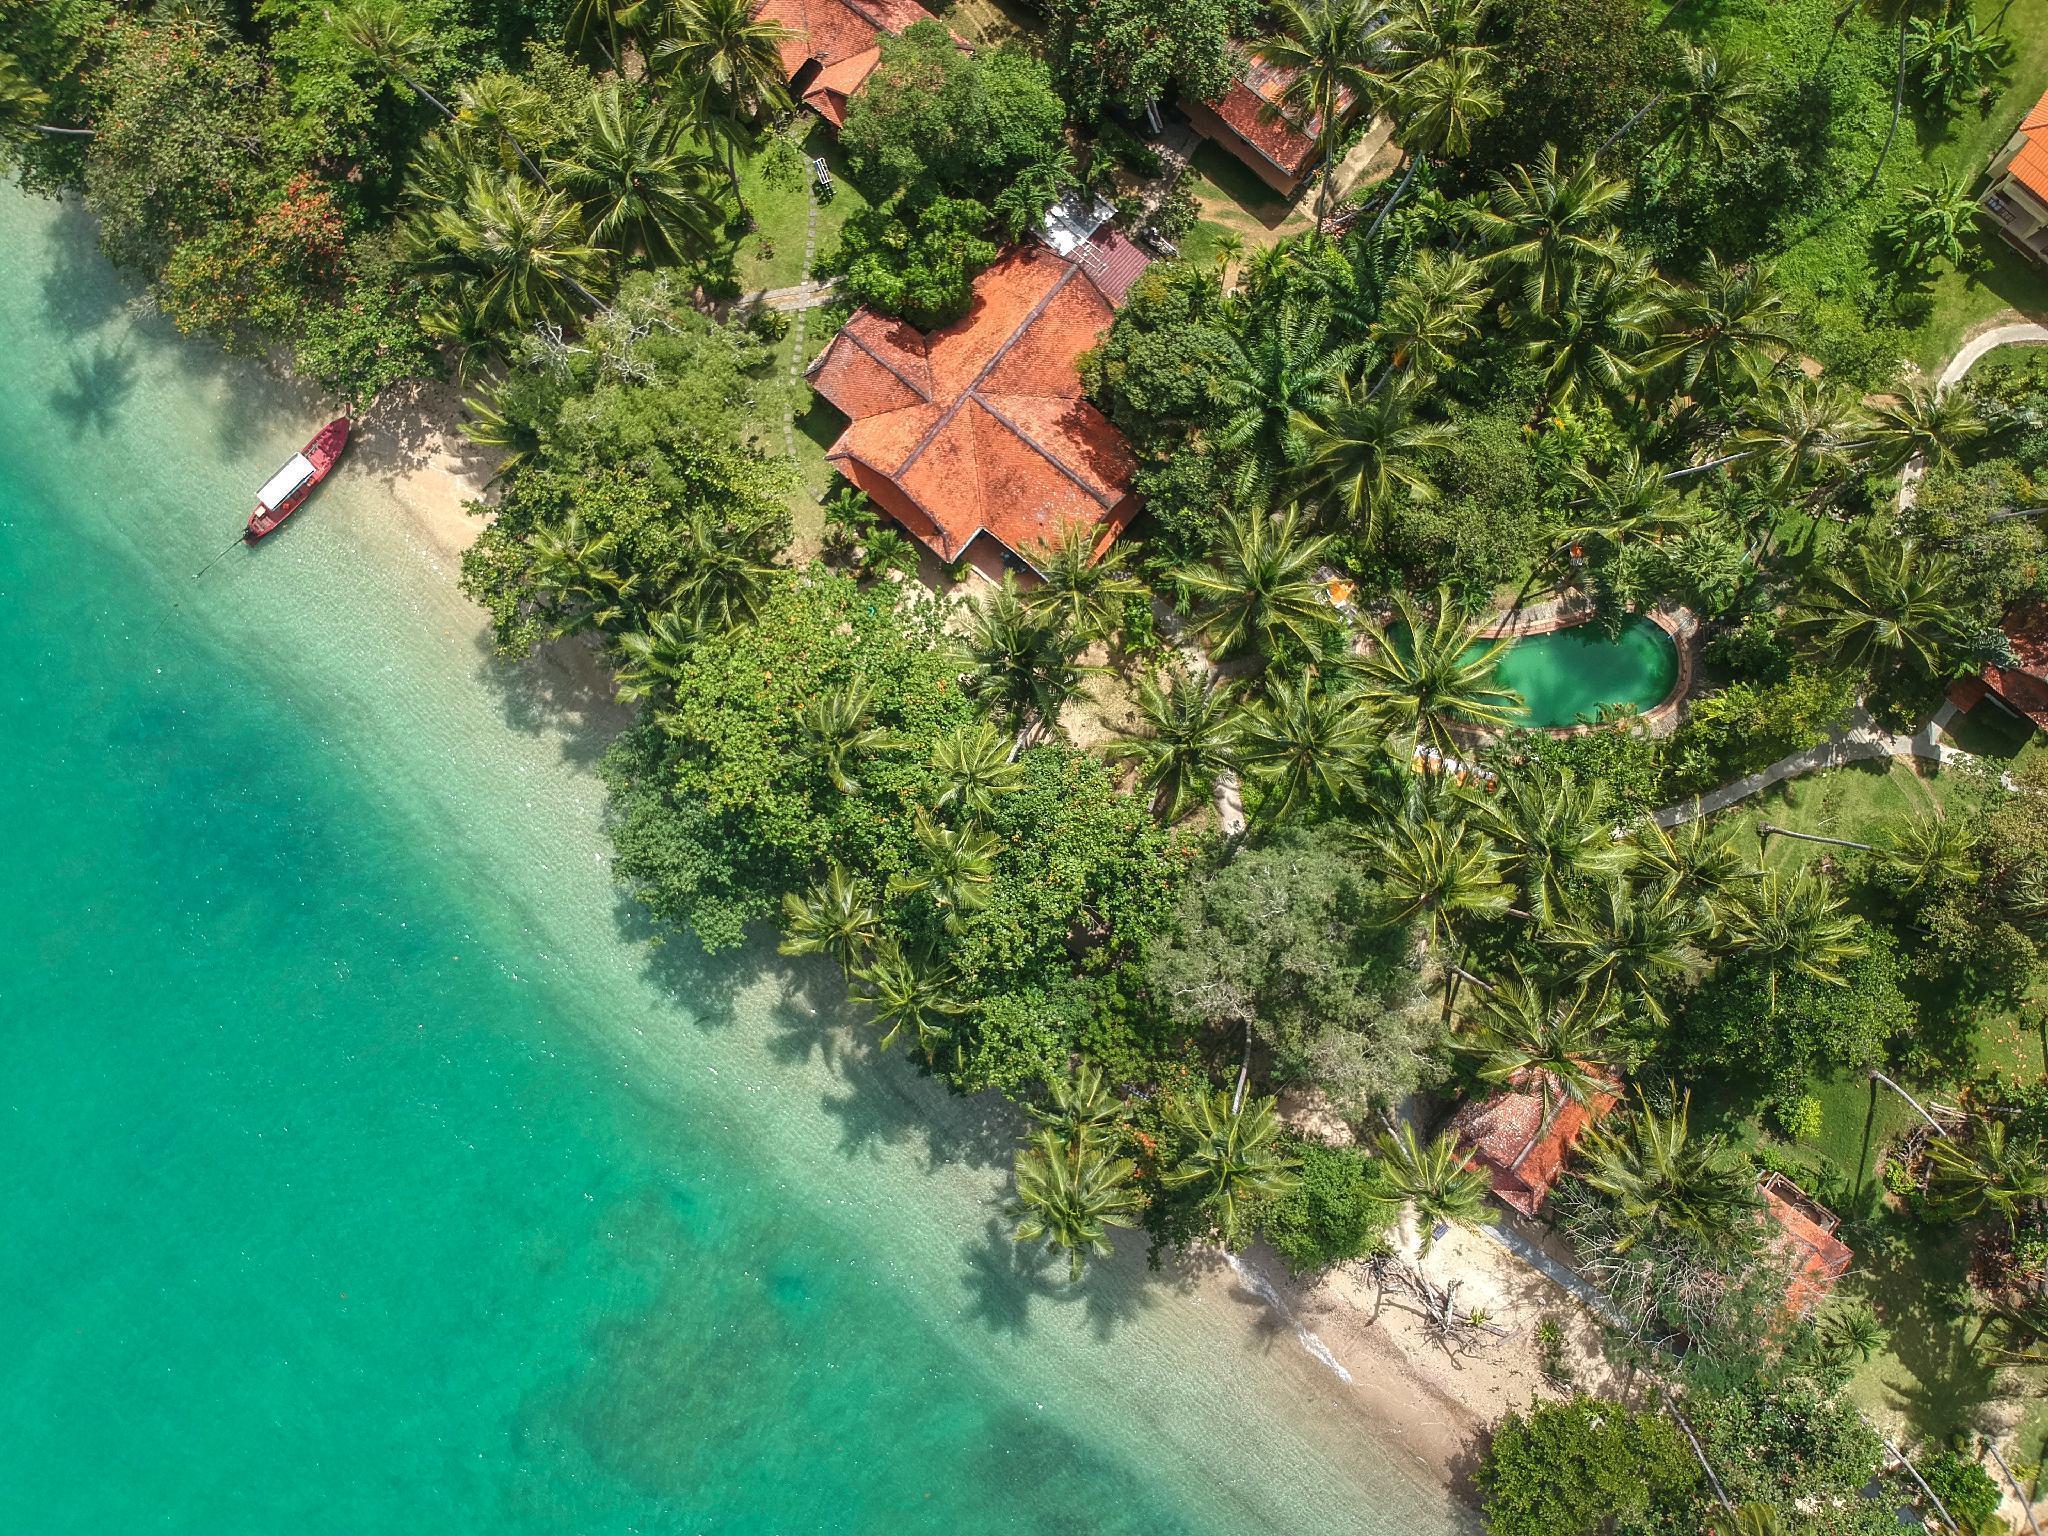 Baan Mai Beachfront Phuket บ้านไม้ บีชฟรอนท์ ภูเก็ต